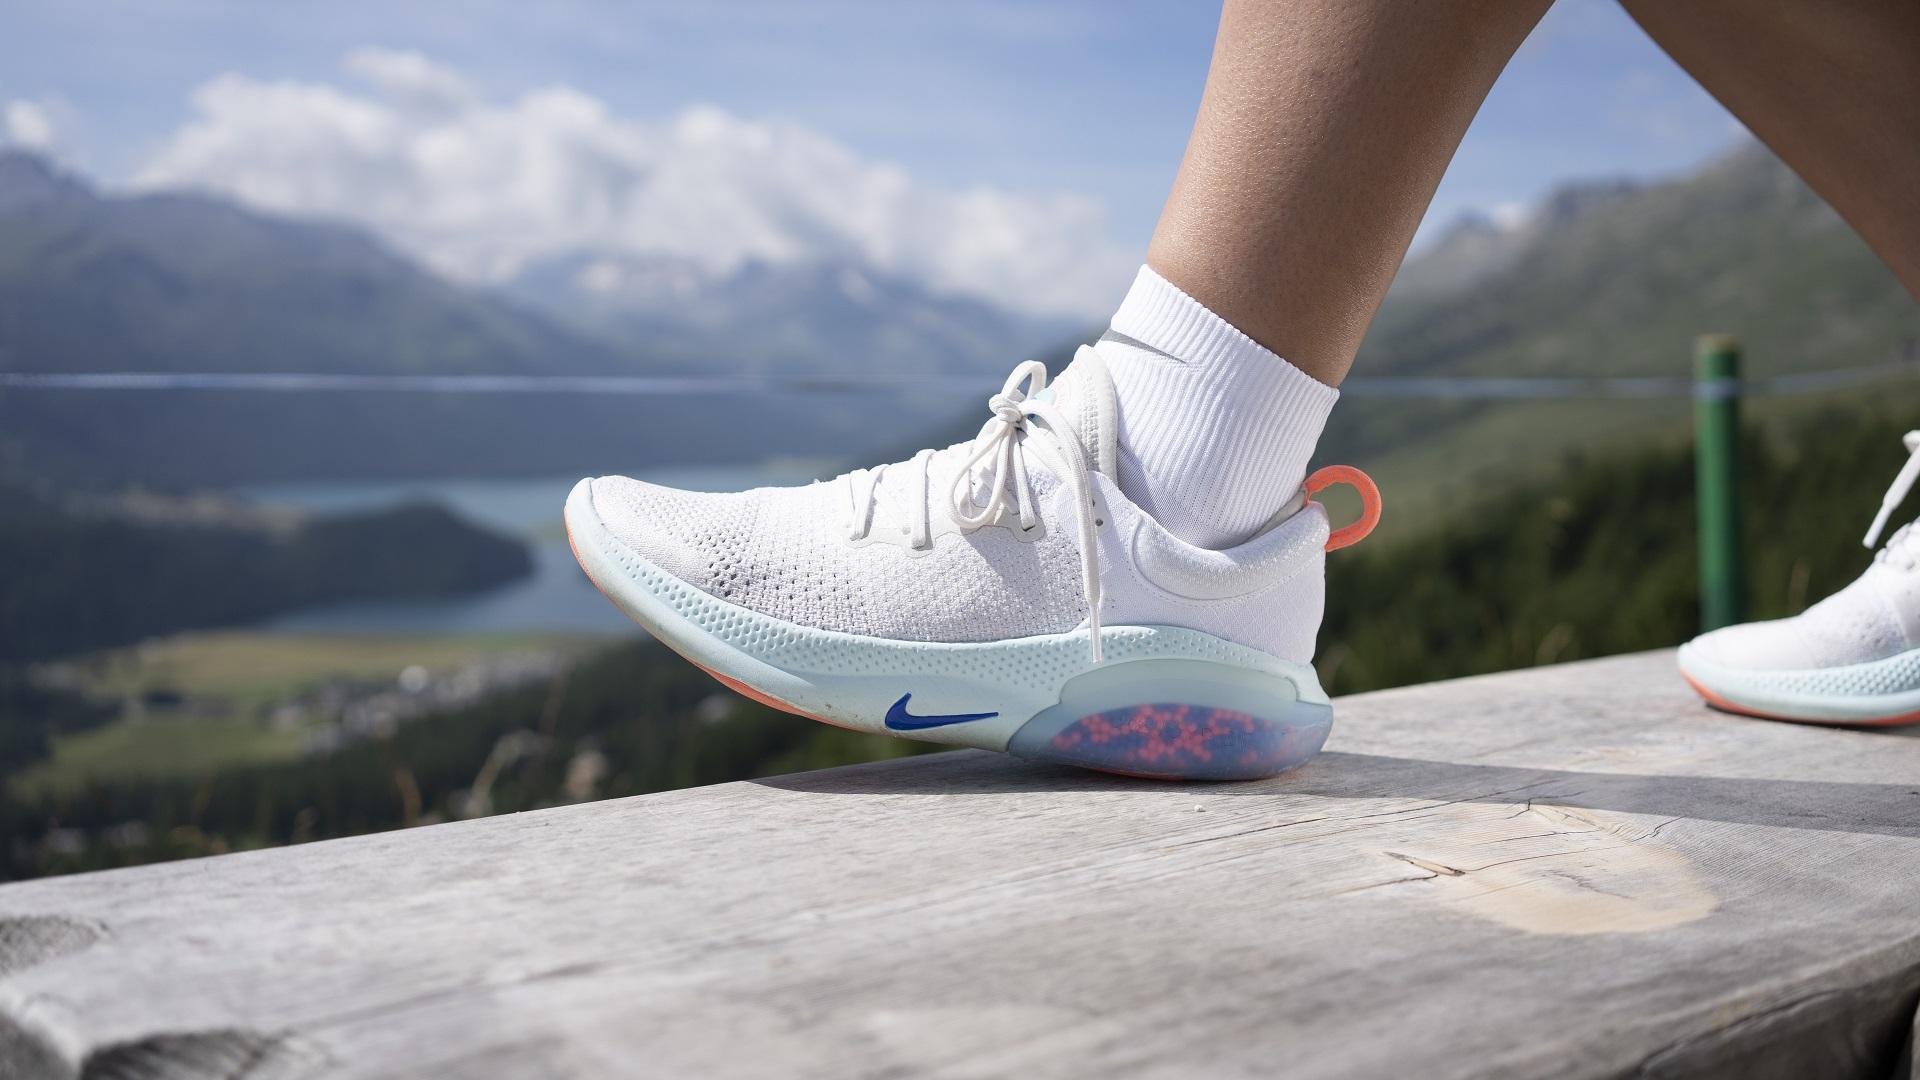 Nike Joyride: Comfort like no other